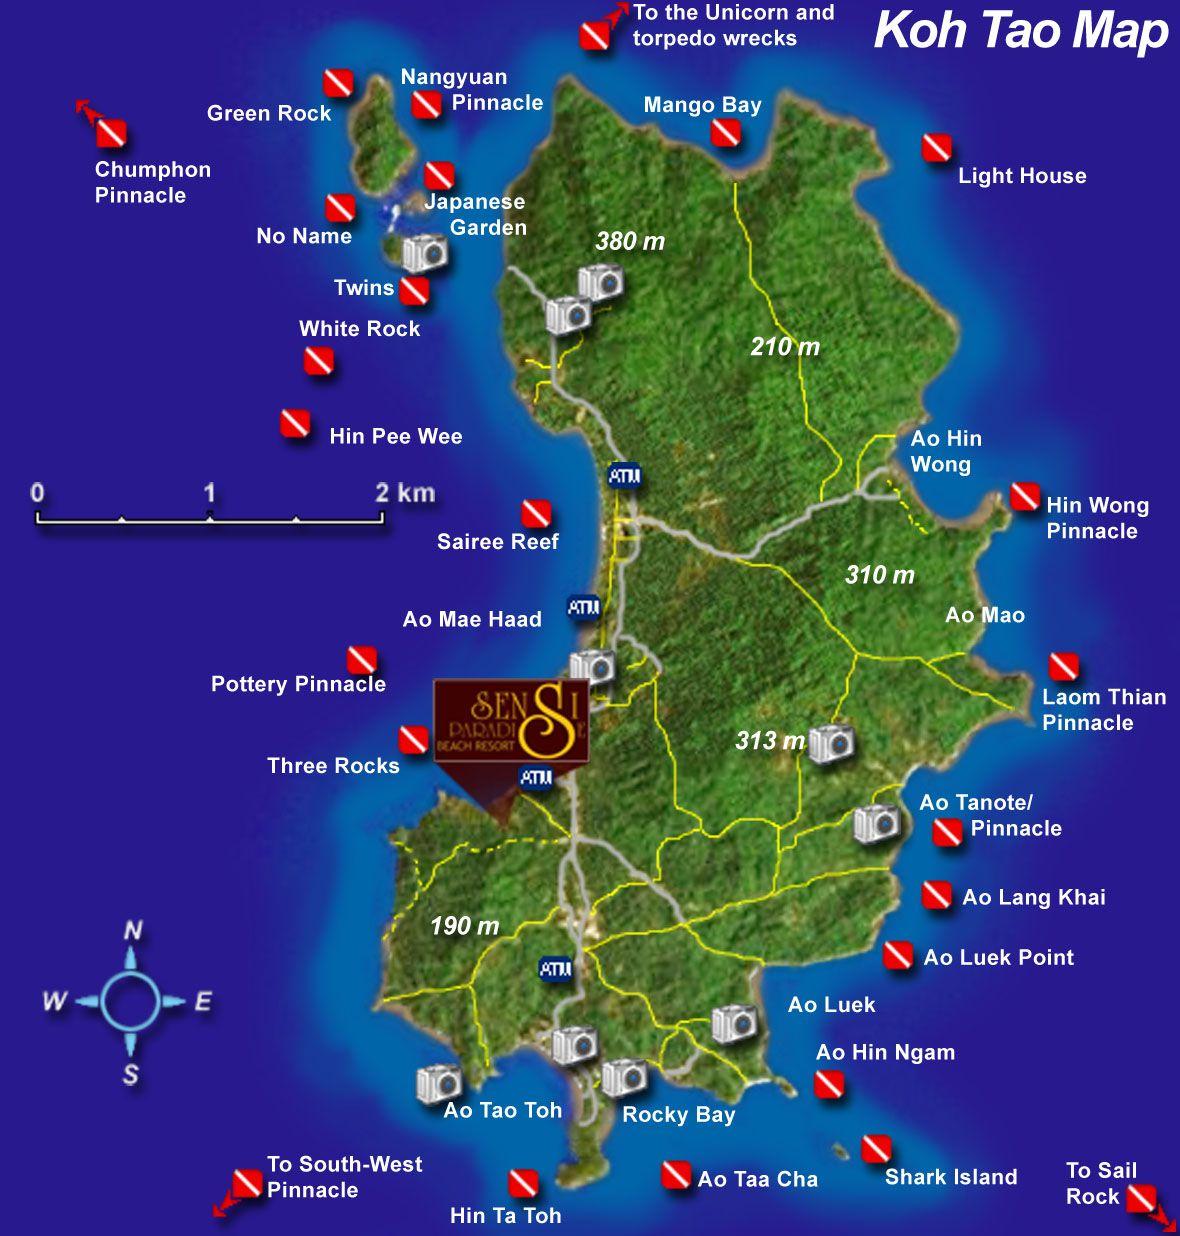 Koh Tao Tourist Map Koh Tao mappery Wander Koh Samui Ko Tao